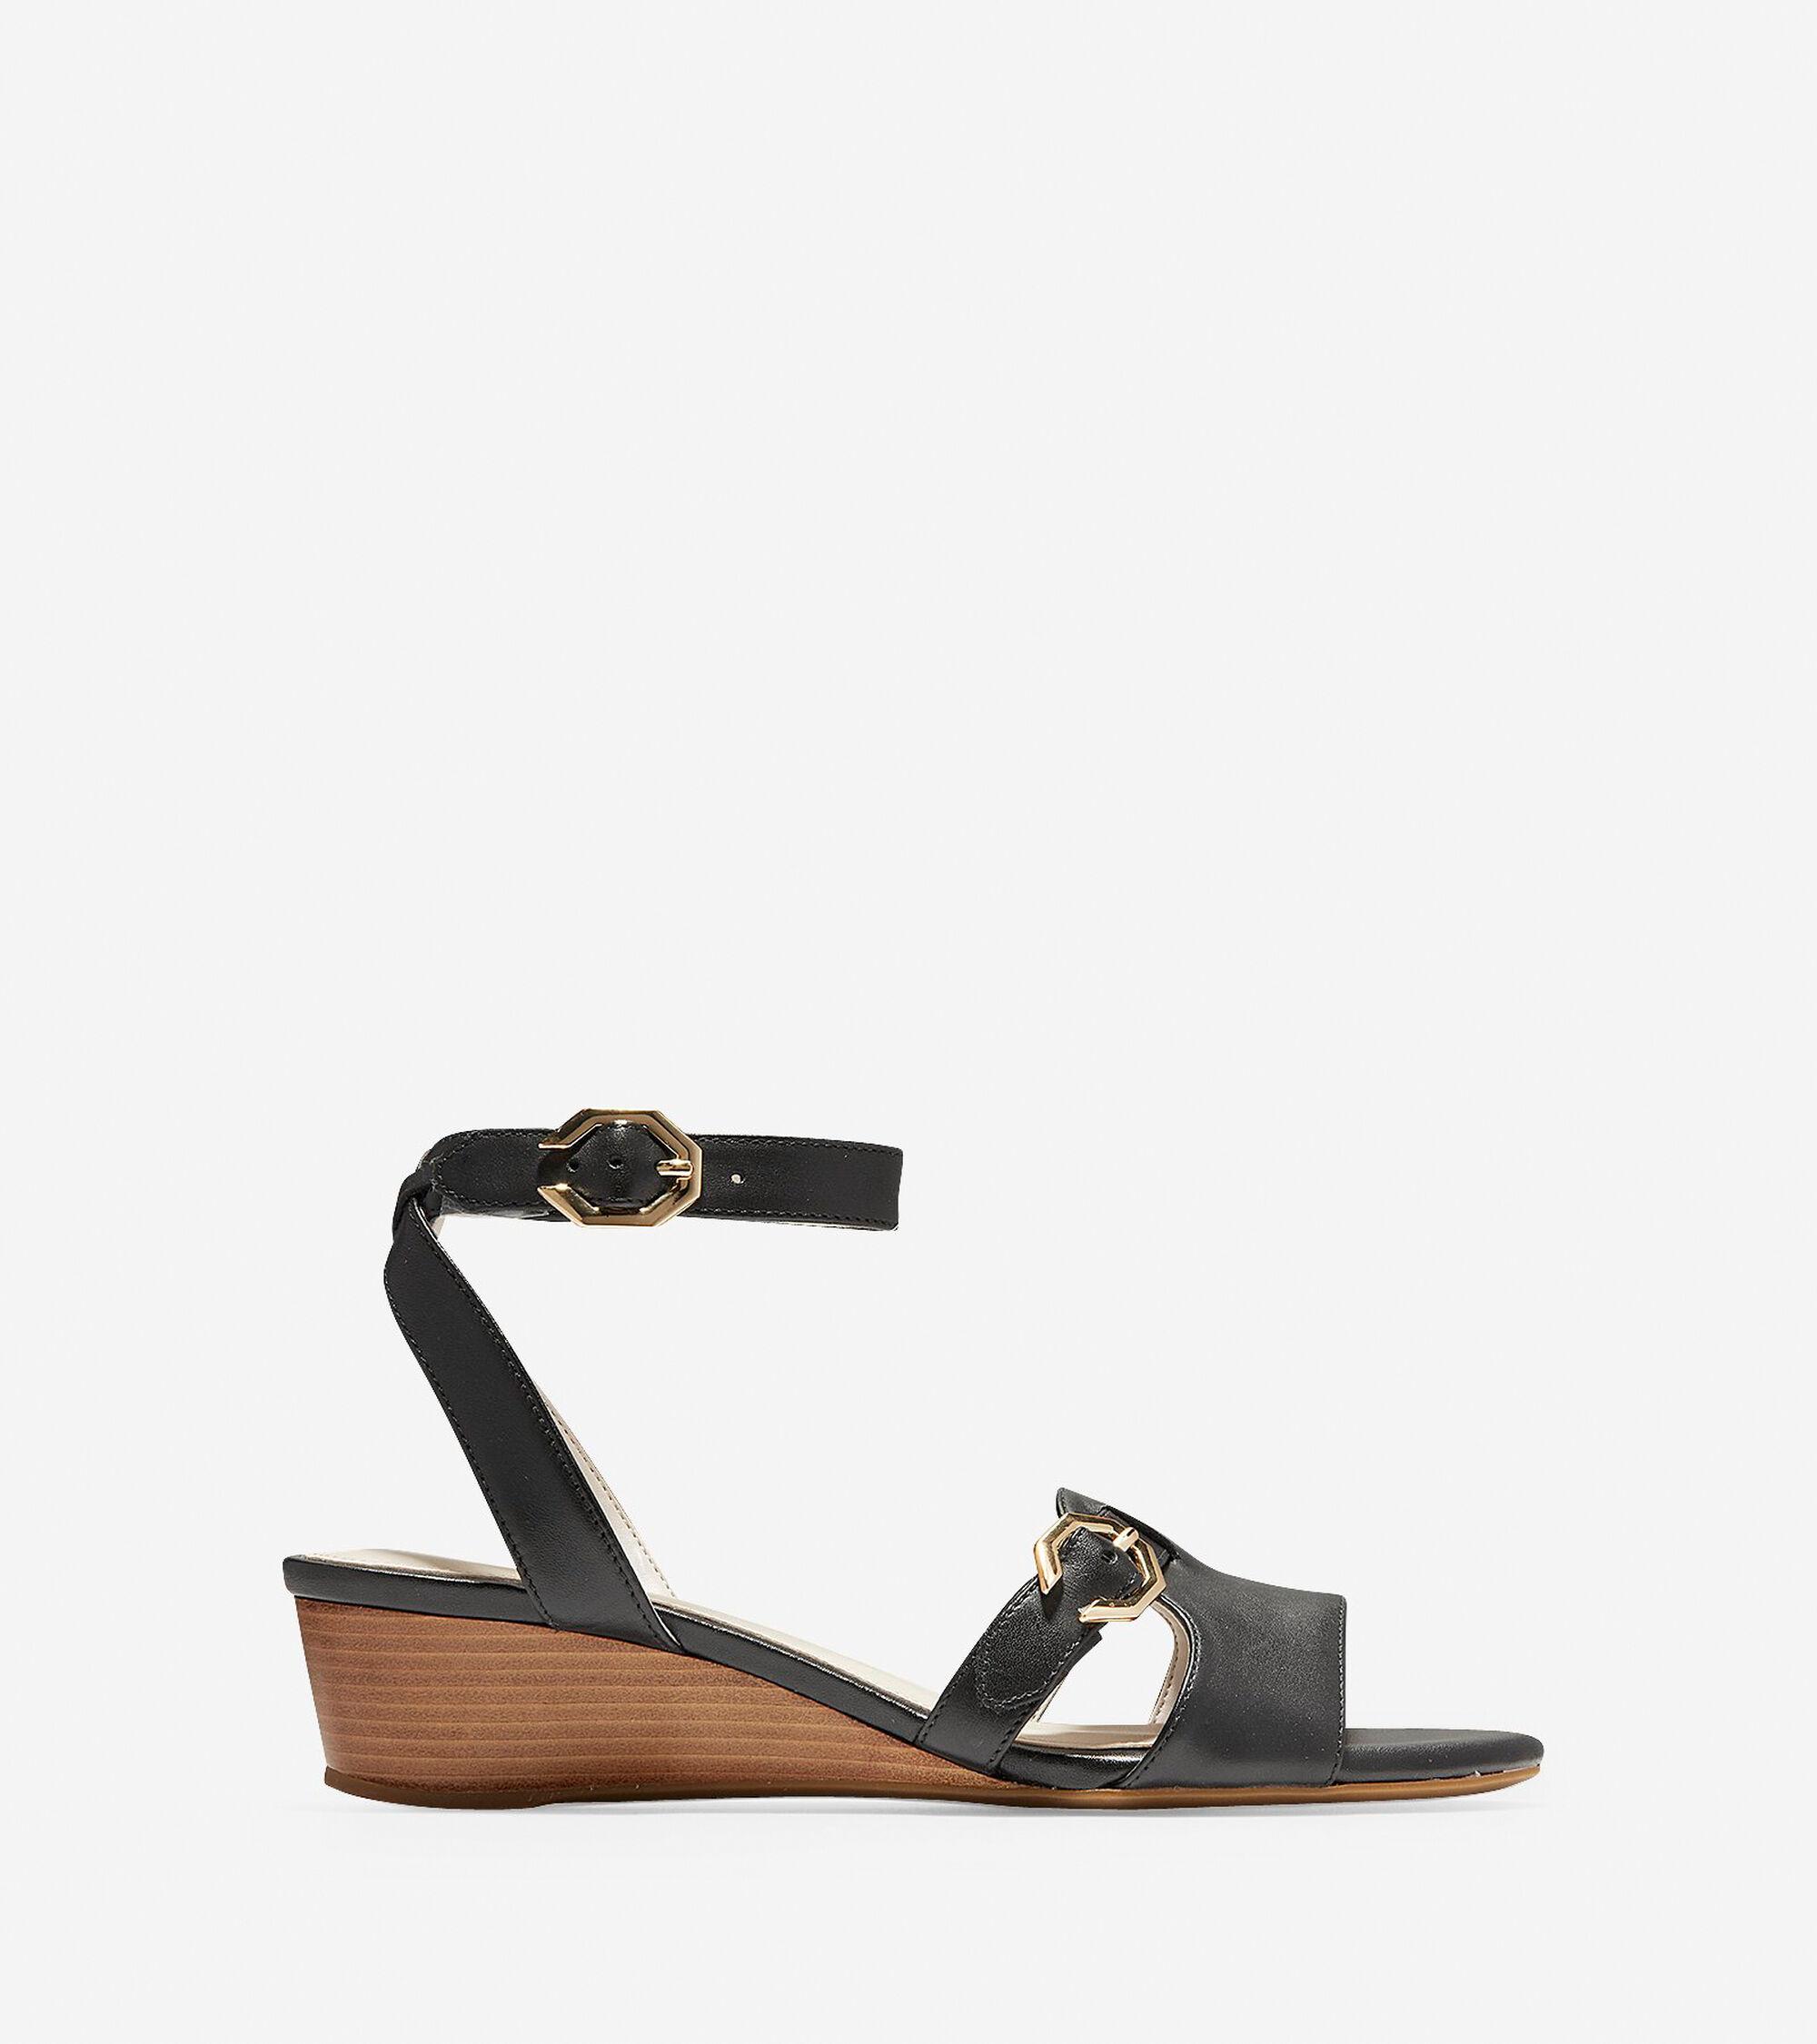 98d43cb210e Women s Terrin Buckle Wedge Sandals in Black